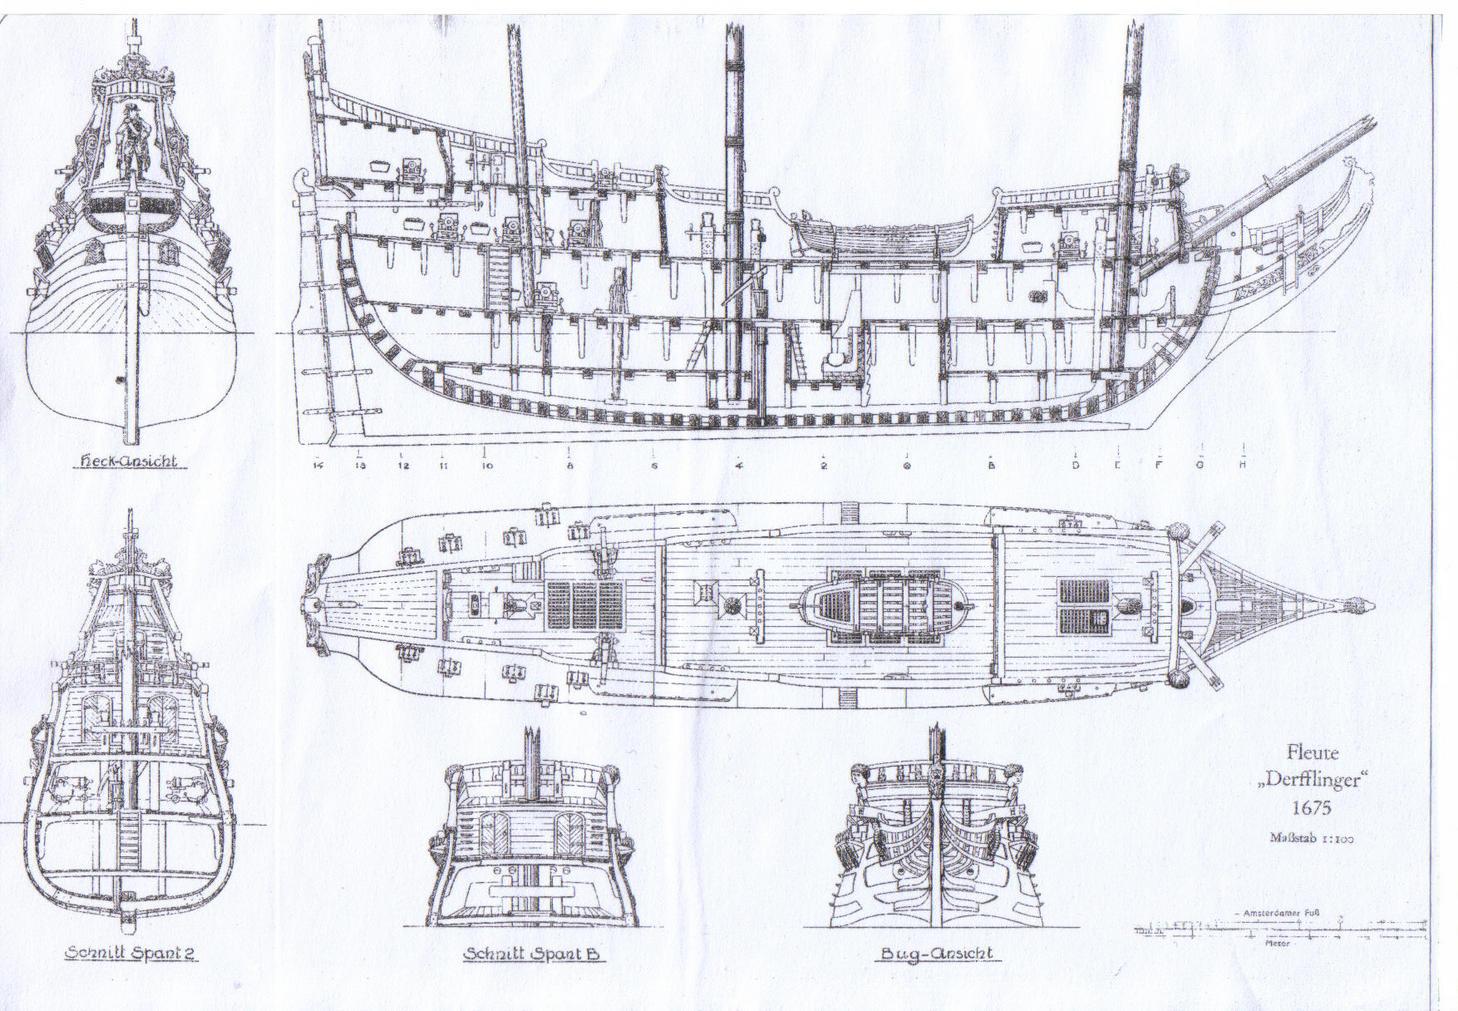 Drawn ship fluit Trading Dutch 189 Fluyt2